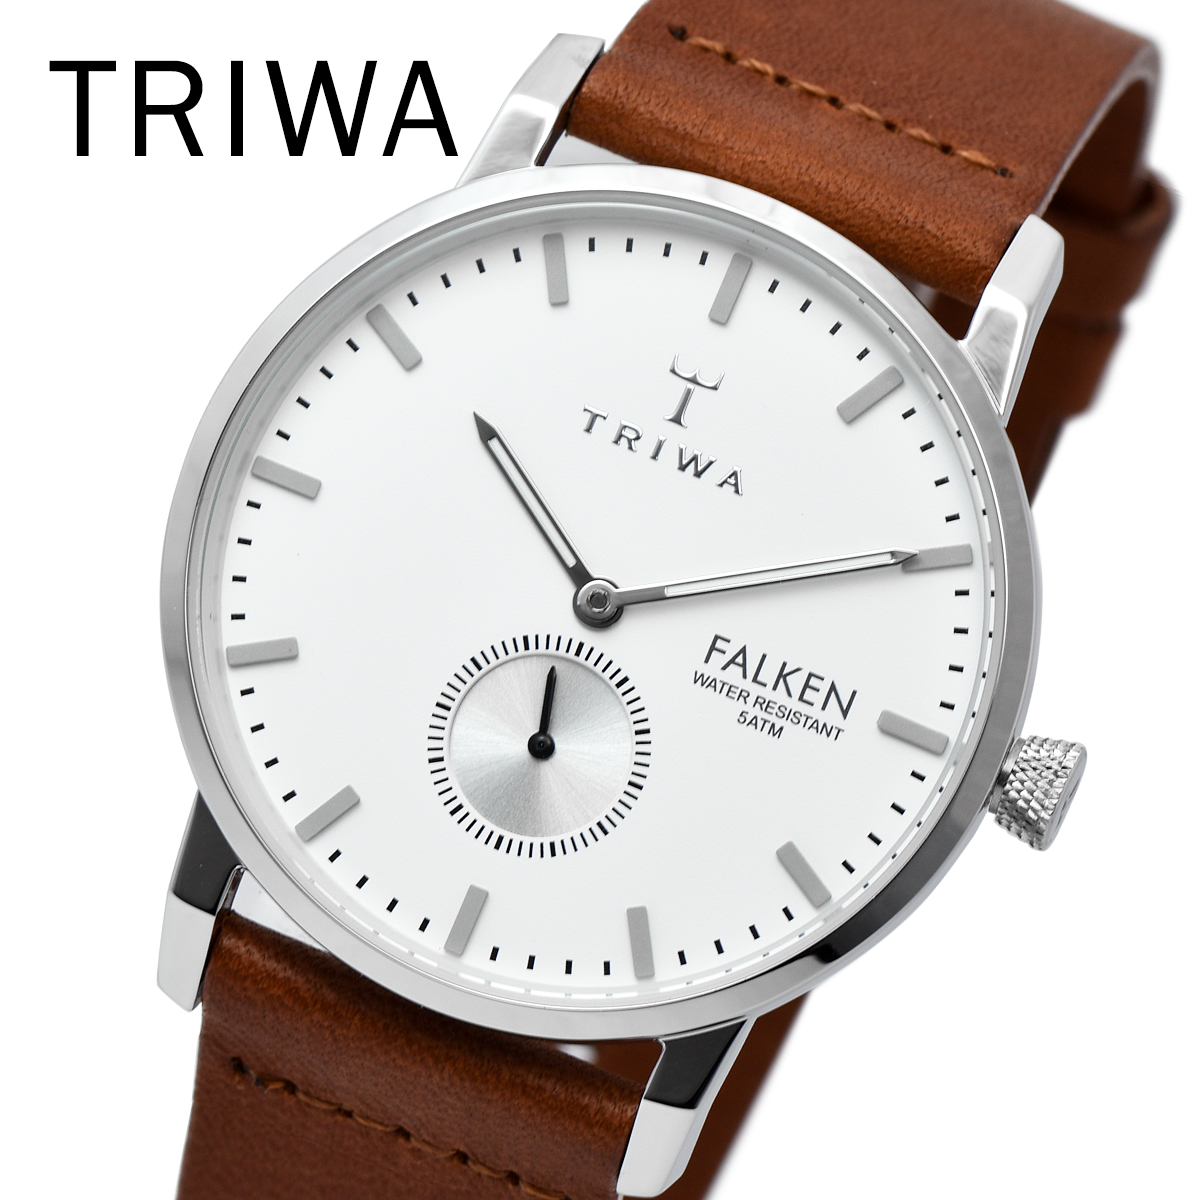 TRIWA トリワ FAST103 CL010212 WALTER FALKEN BROWN メンズ レディース ユニセックス 時計 腕時計 プレゼント 贈り物 ギフト 彼氏 フォーマル カジュアル ペアウォッチ 北欧[あす楽]